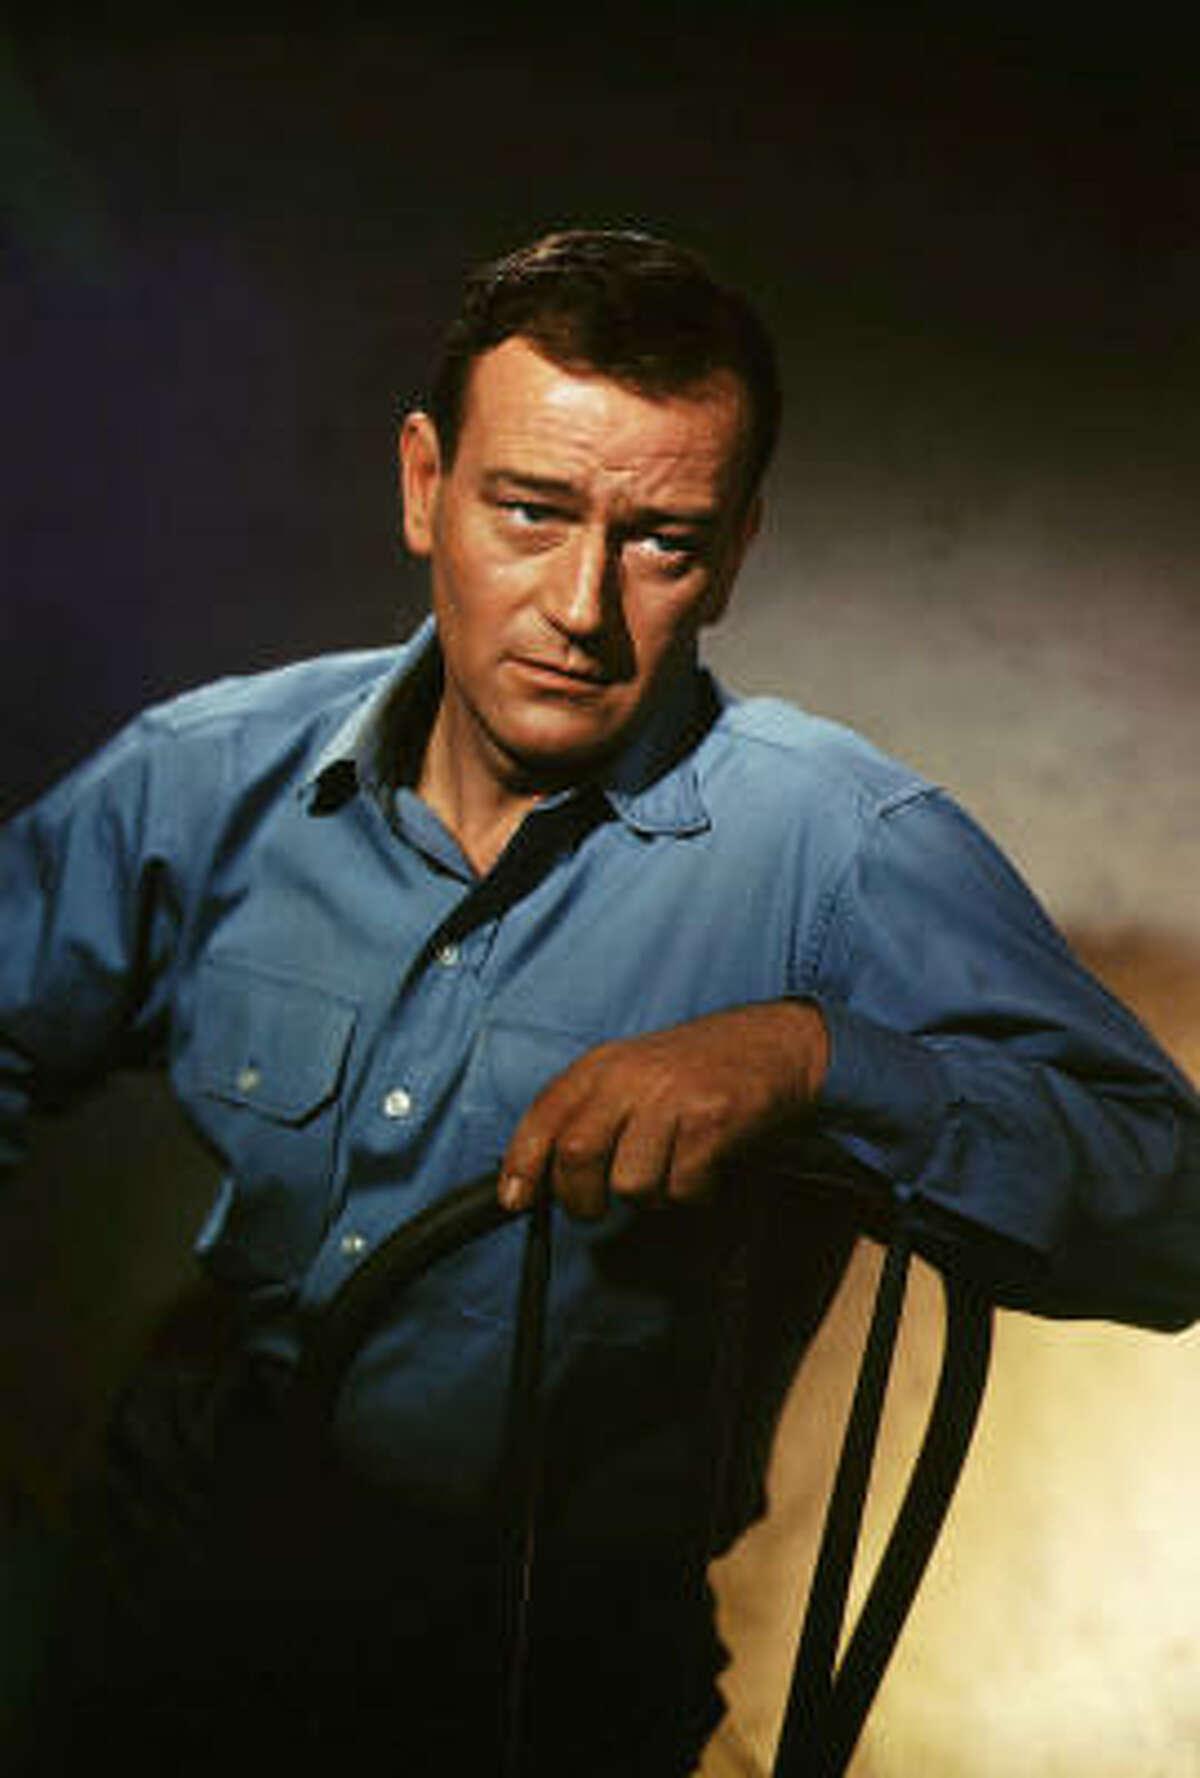 John Wayne filmed scenes for the sci-fi western before his death in 1979.